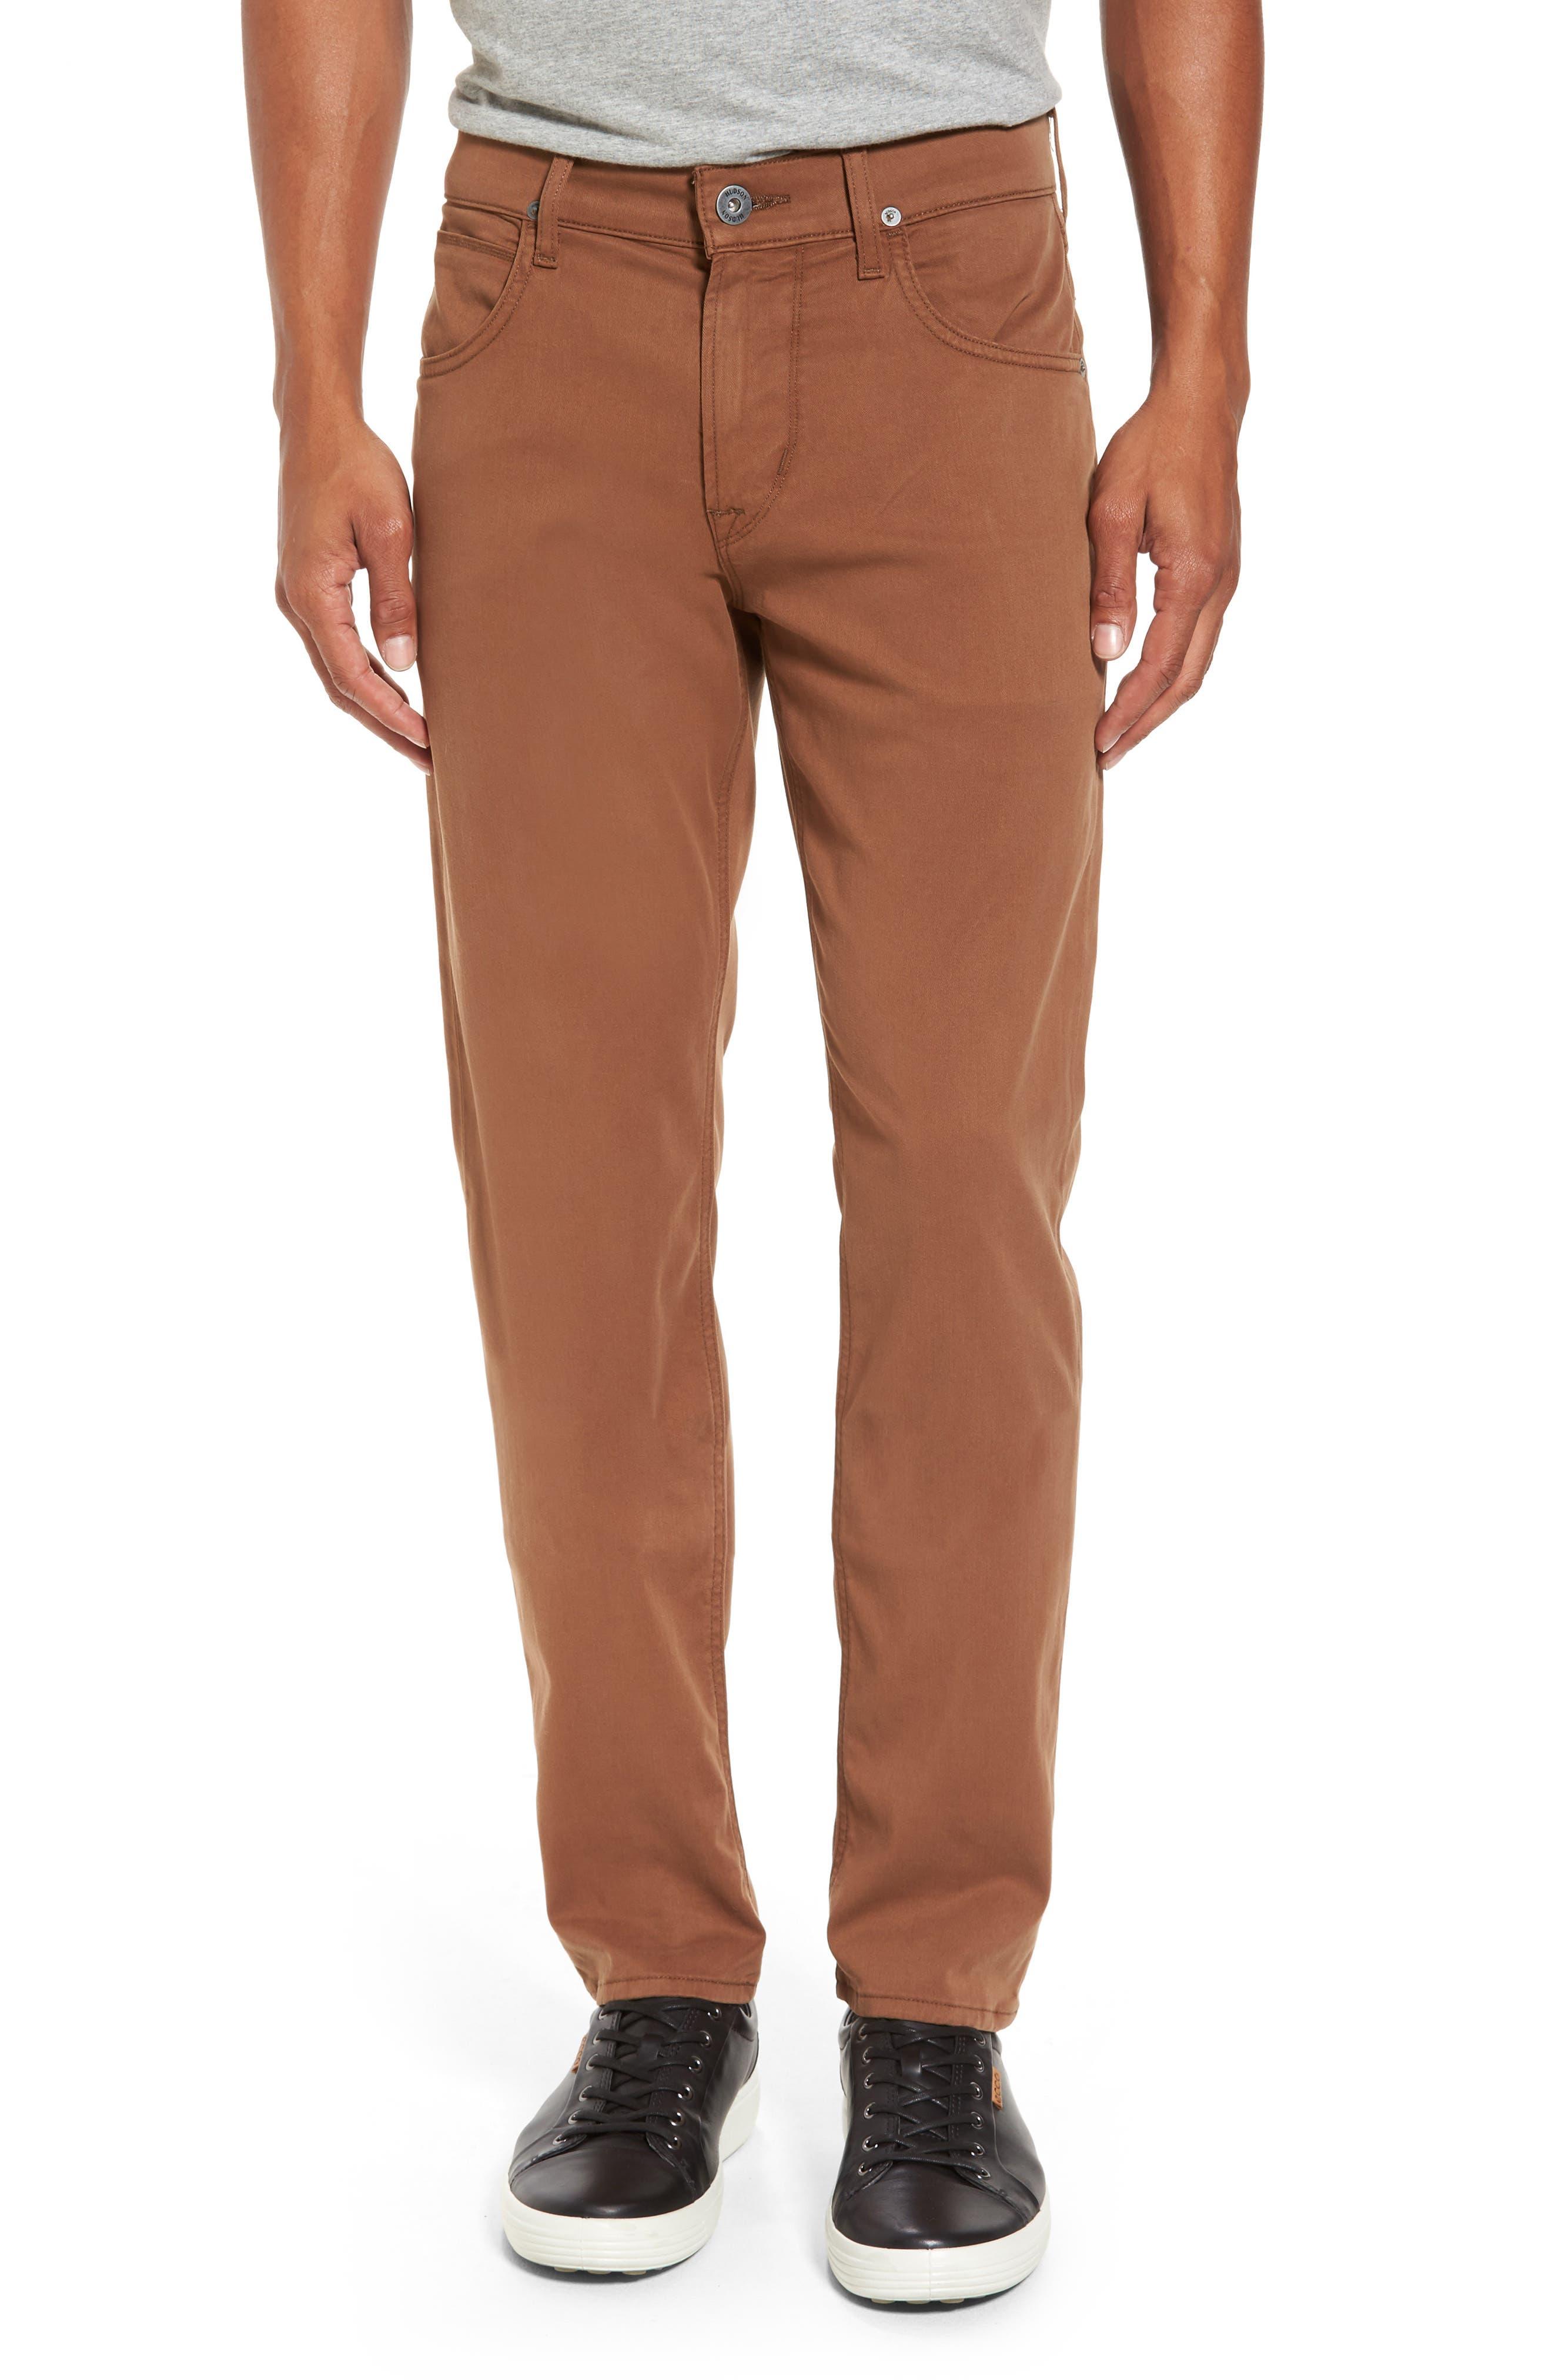 Alternate Image 1 Selected - Hudson Jeans Blake Slim Fit Jeans (Masonite)